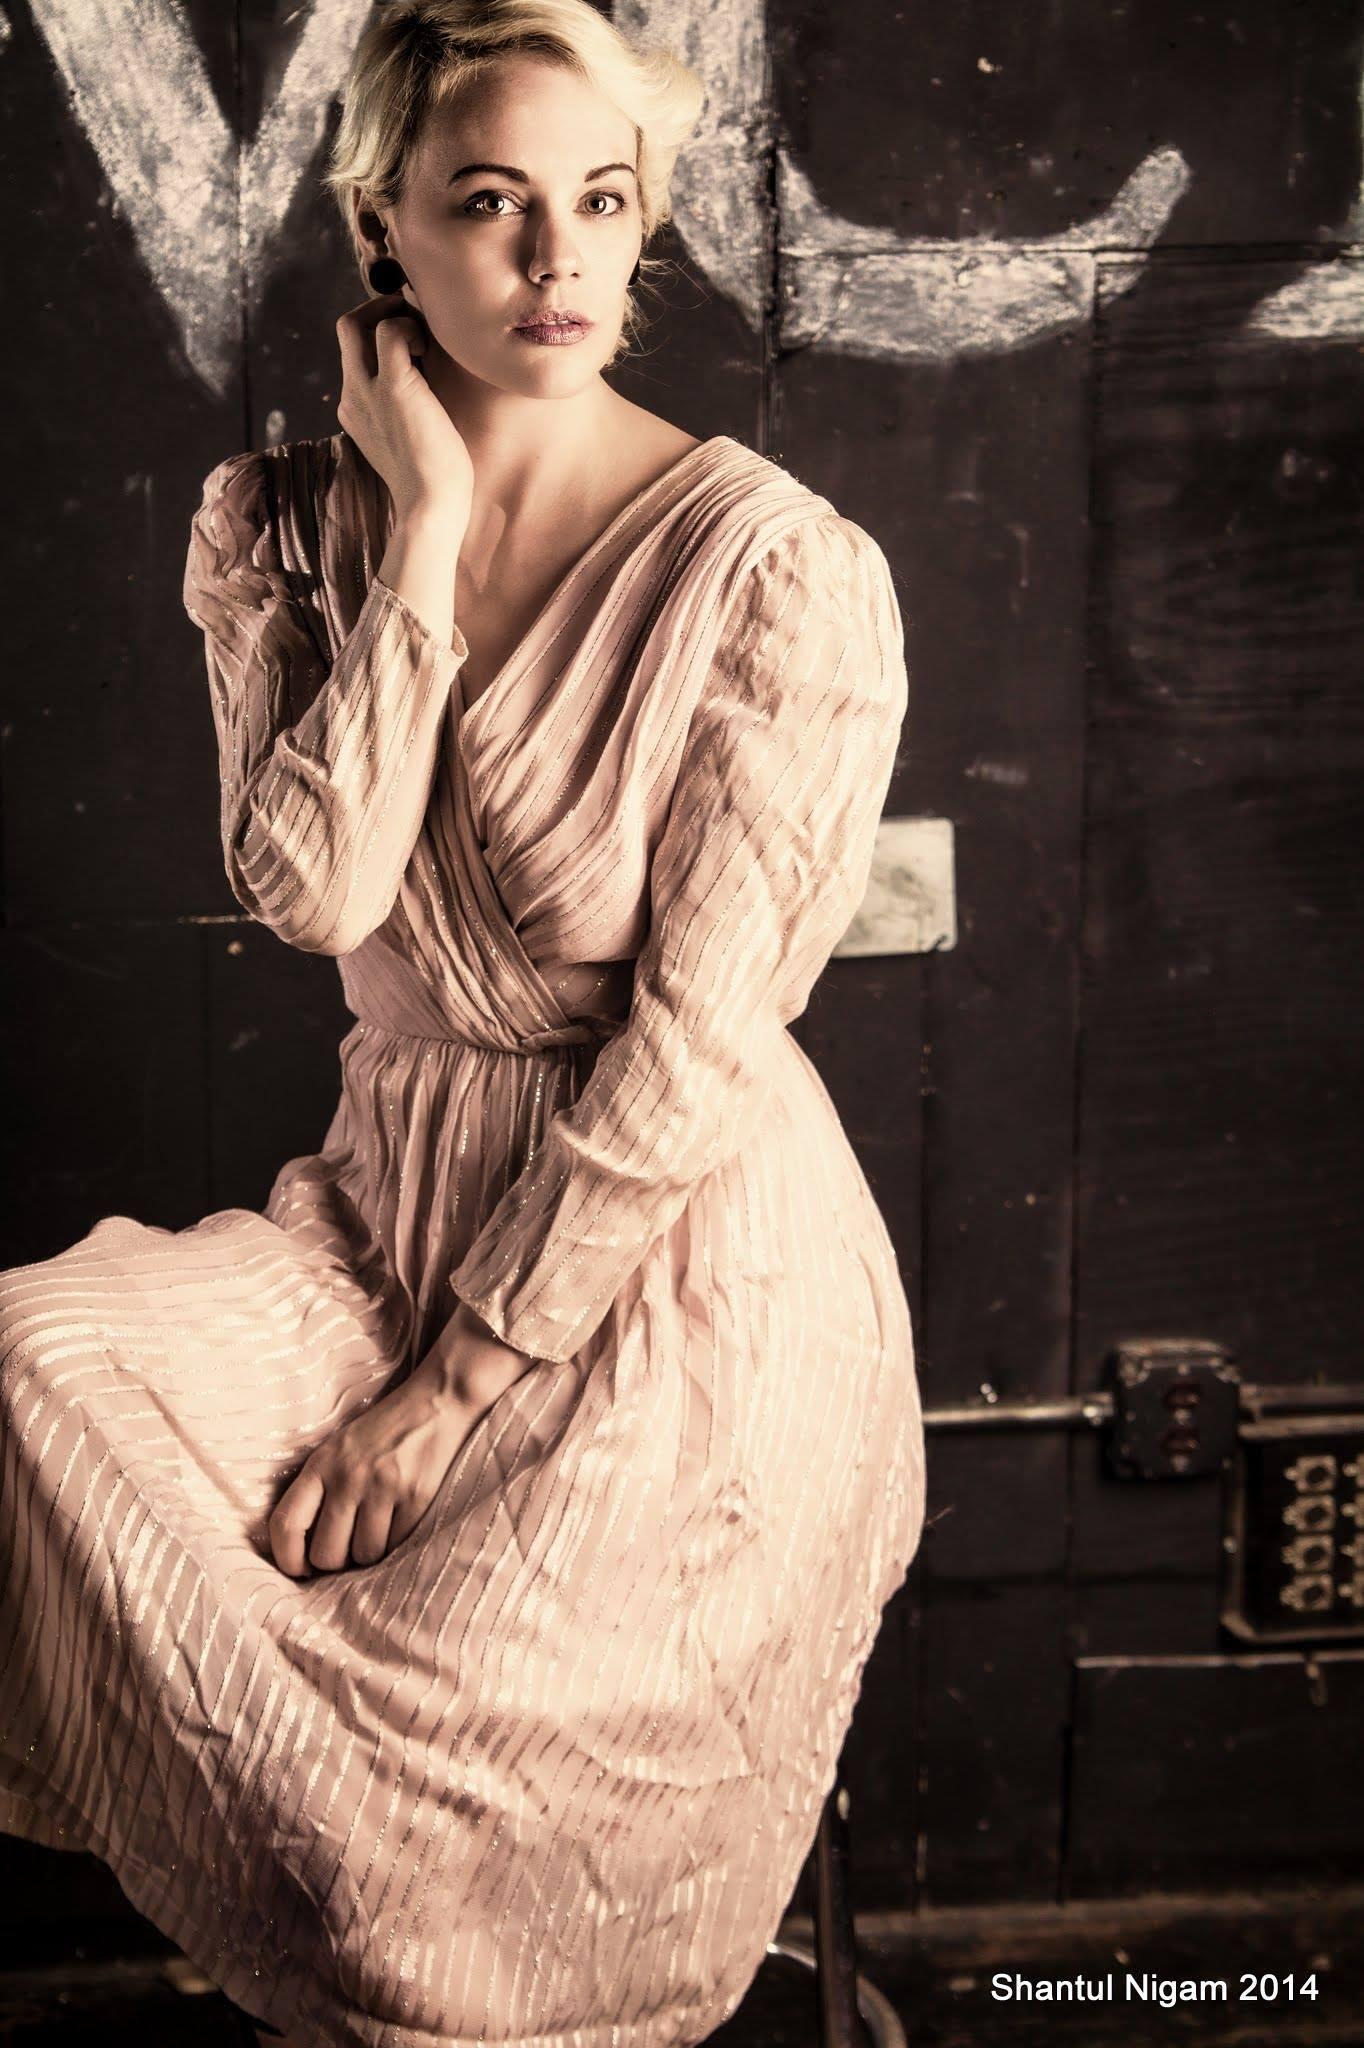 isabel-marie-vinson-amazing-shoot